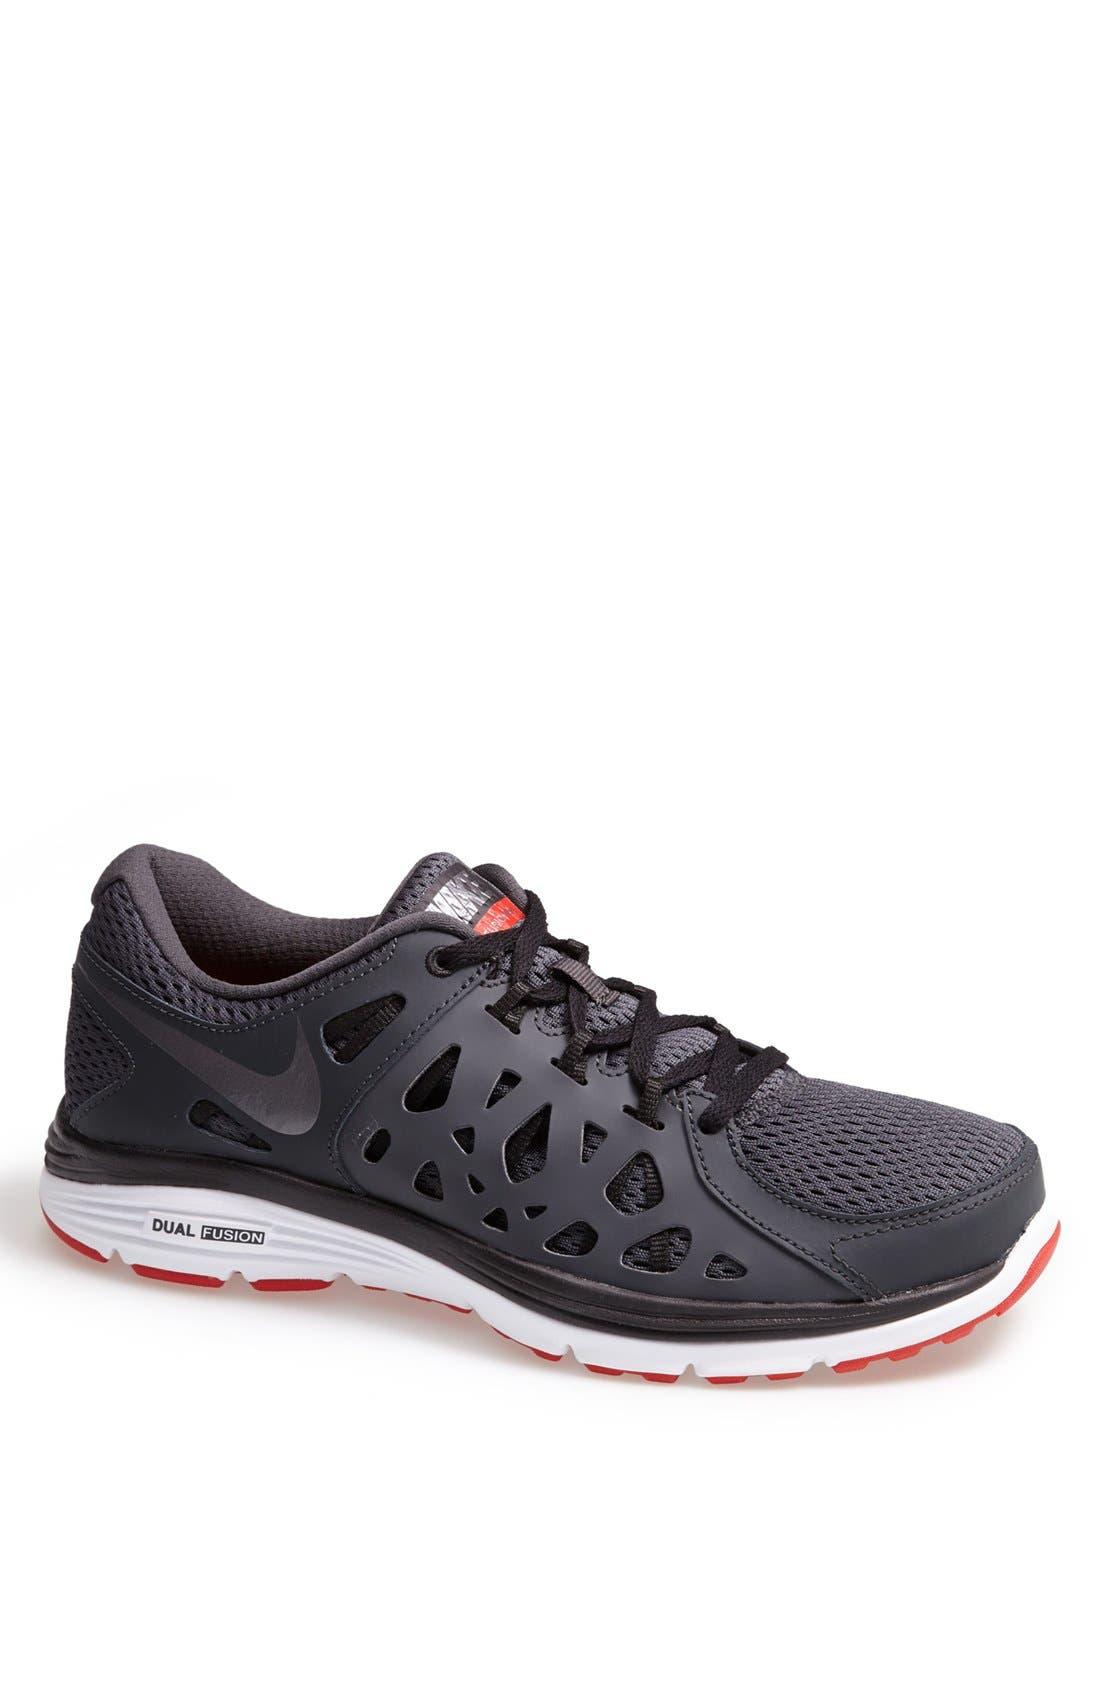 Alternate Image 1 Selected - Nike 'Dual Fusion Run 2' Running Shoe (Men)